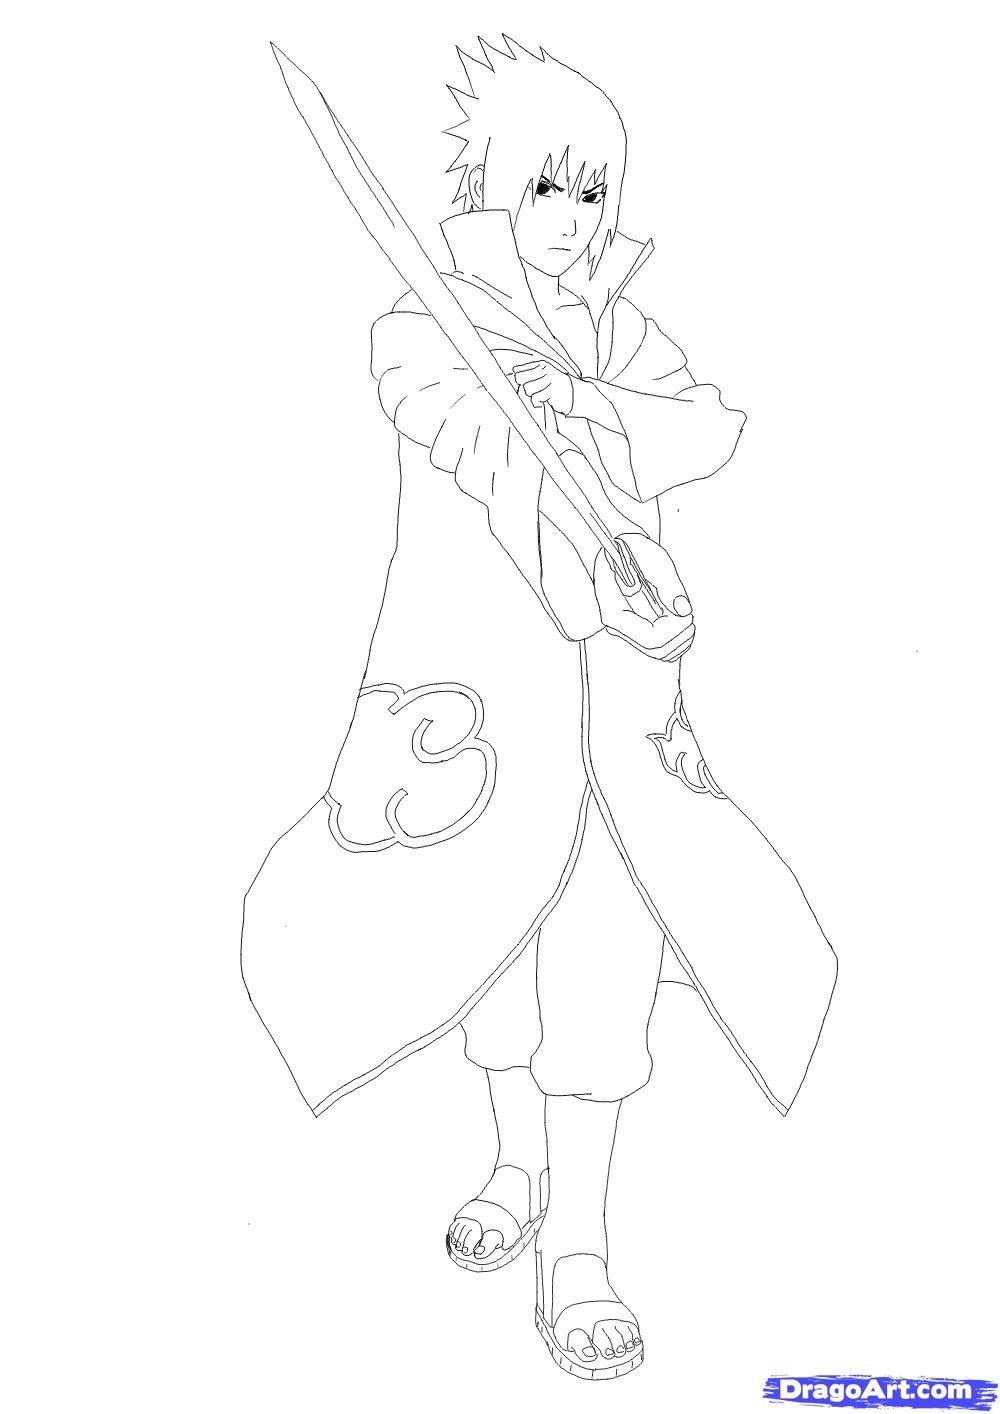 How To Draw Sasuke Akatsuki By Xjoaorpxx Desenho Da Pantera